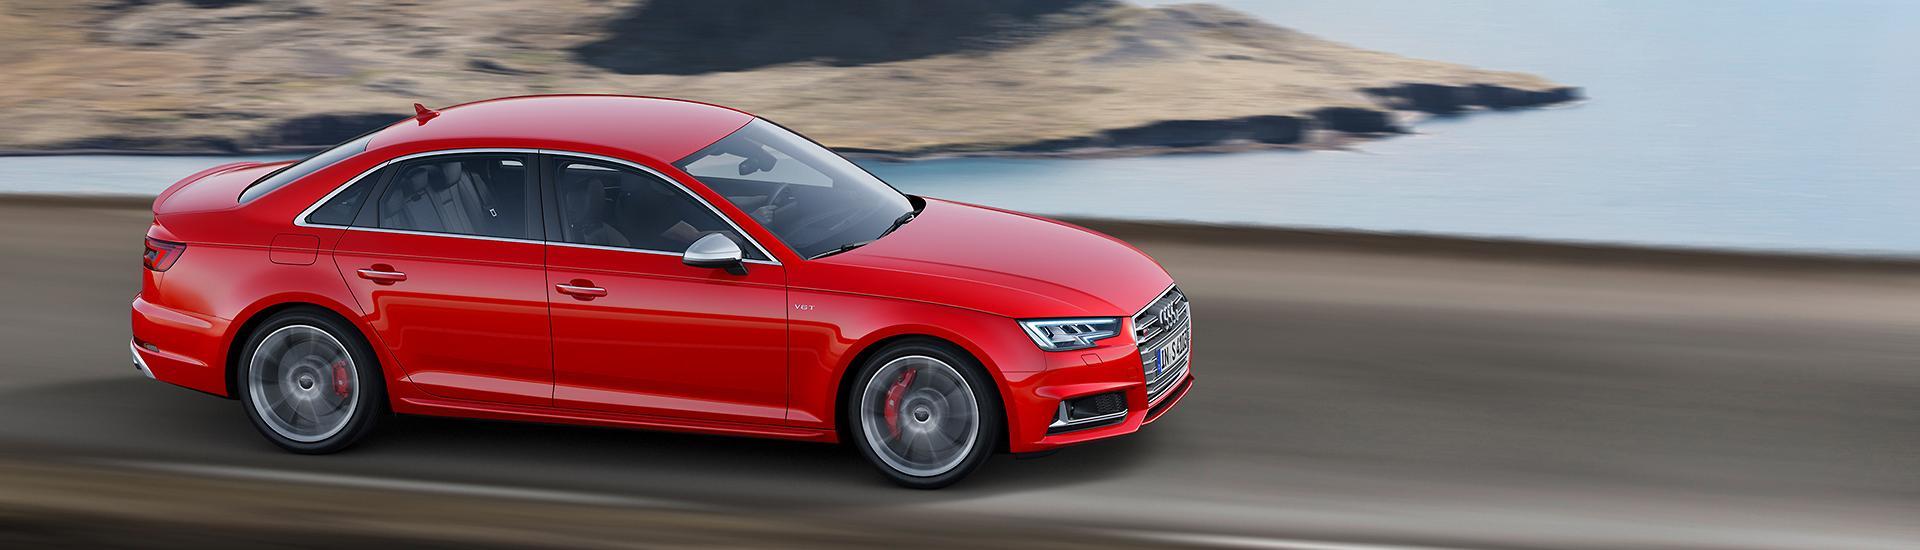 New Audi S Sedan Cars For Sale Carsalescomau - Audi s4 for sale